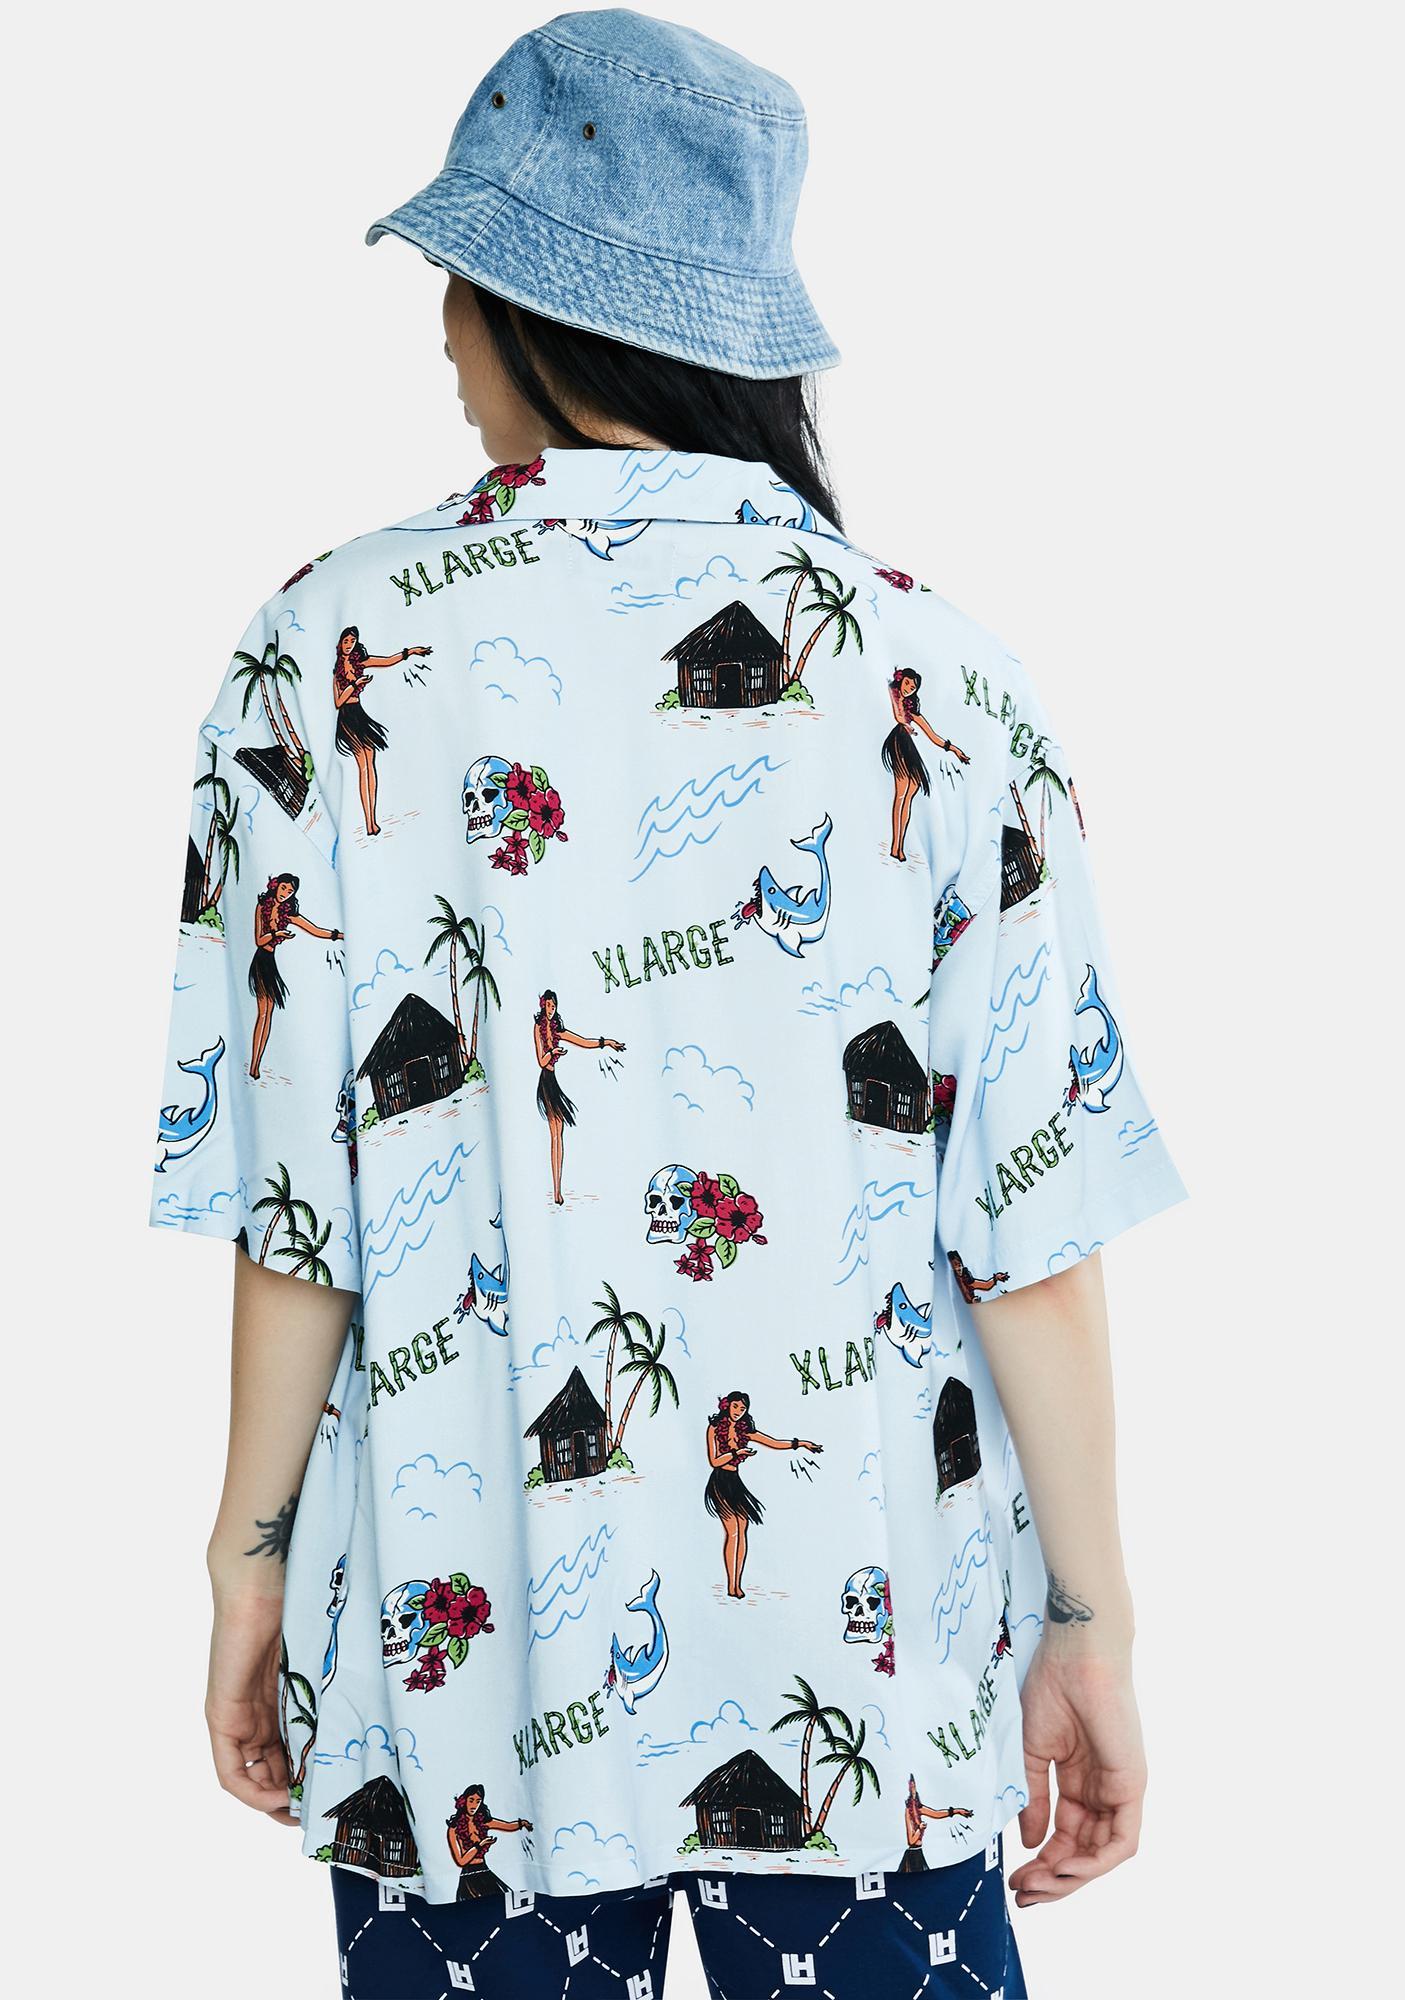 XLARGE Vintage Aloha Button Up Shirt